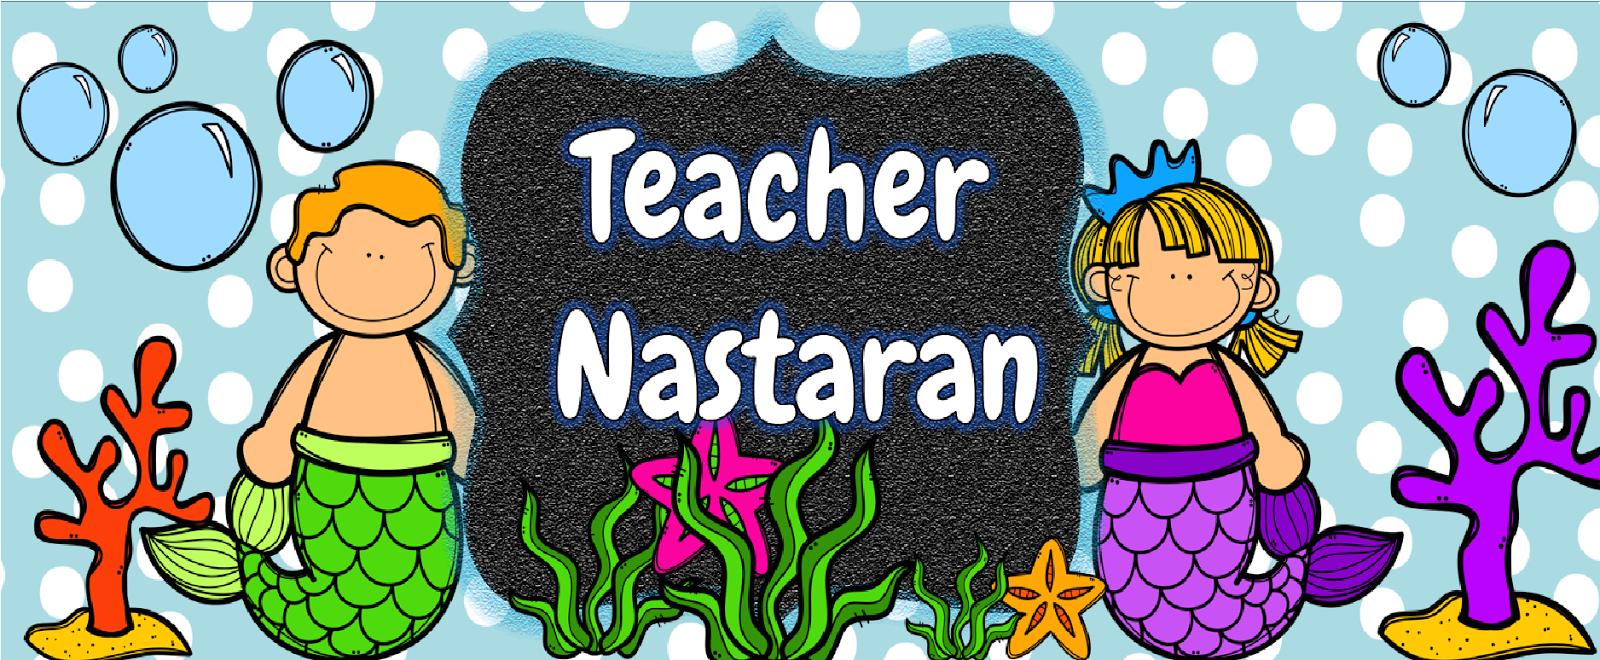 Teacher Nastaran